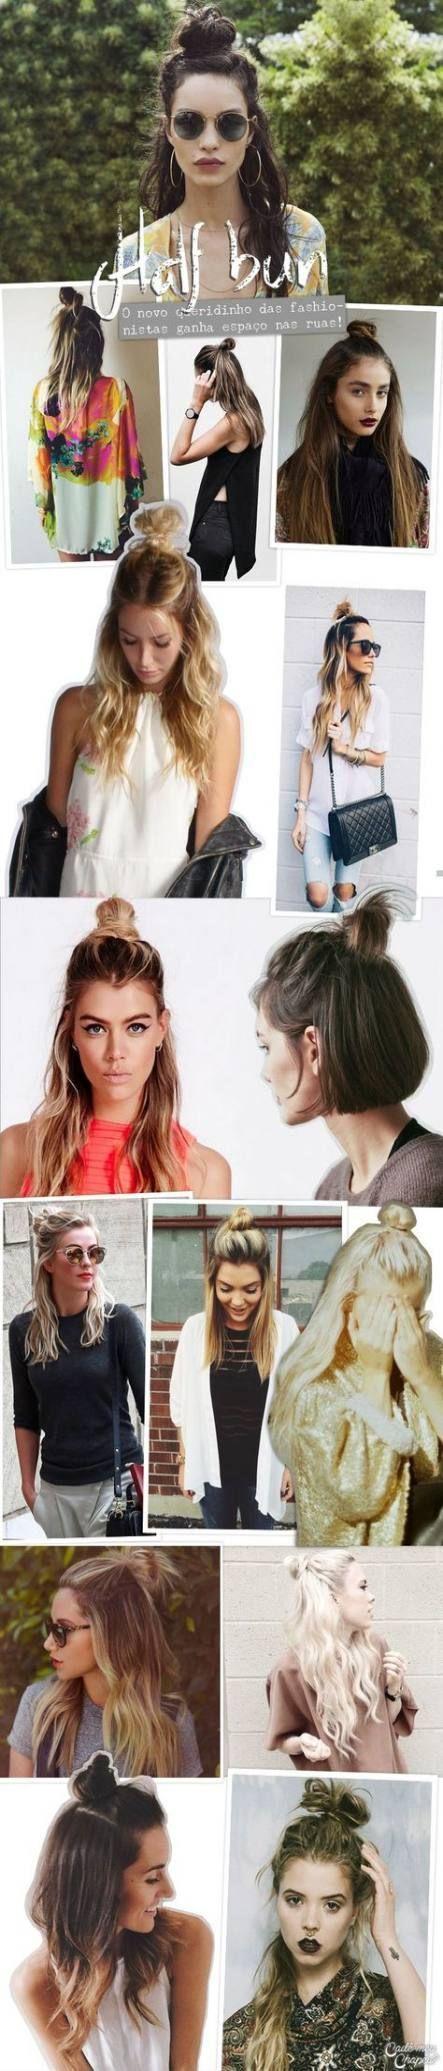 Best Hair Messy Styles Top Knot 59 Ideas  #Hair #Ideas #knot #messy #Styles #Top,  #Hair #Ide...